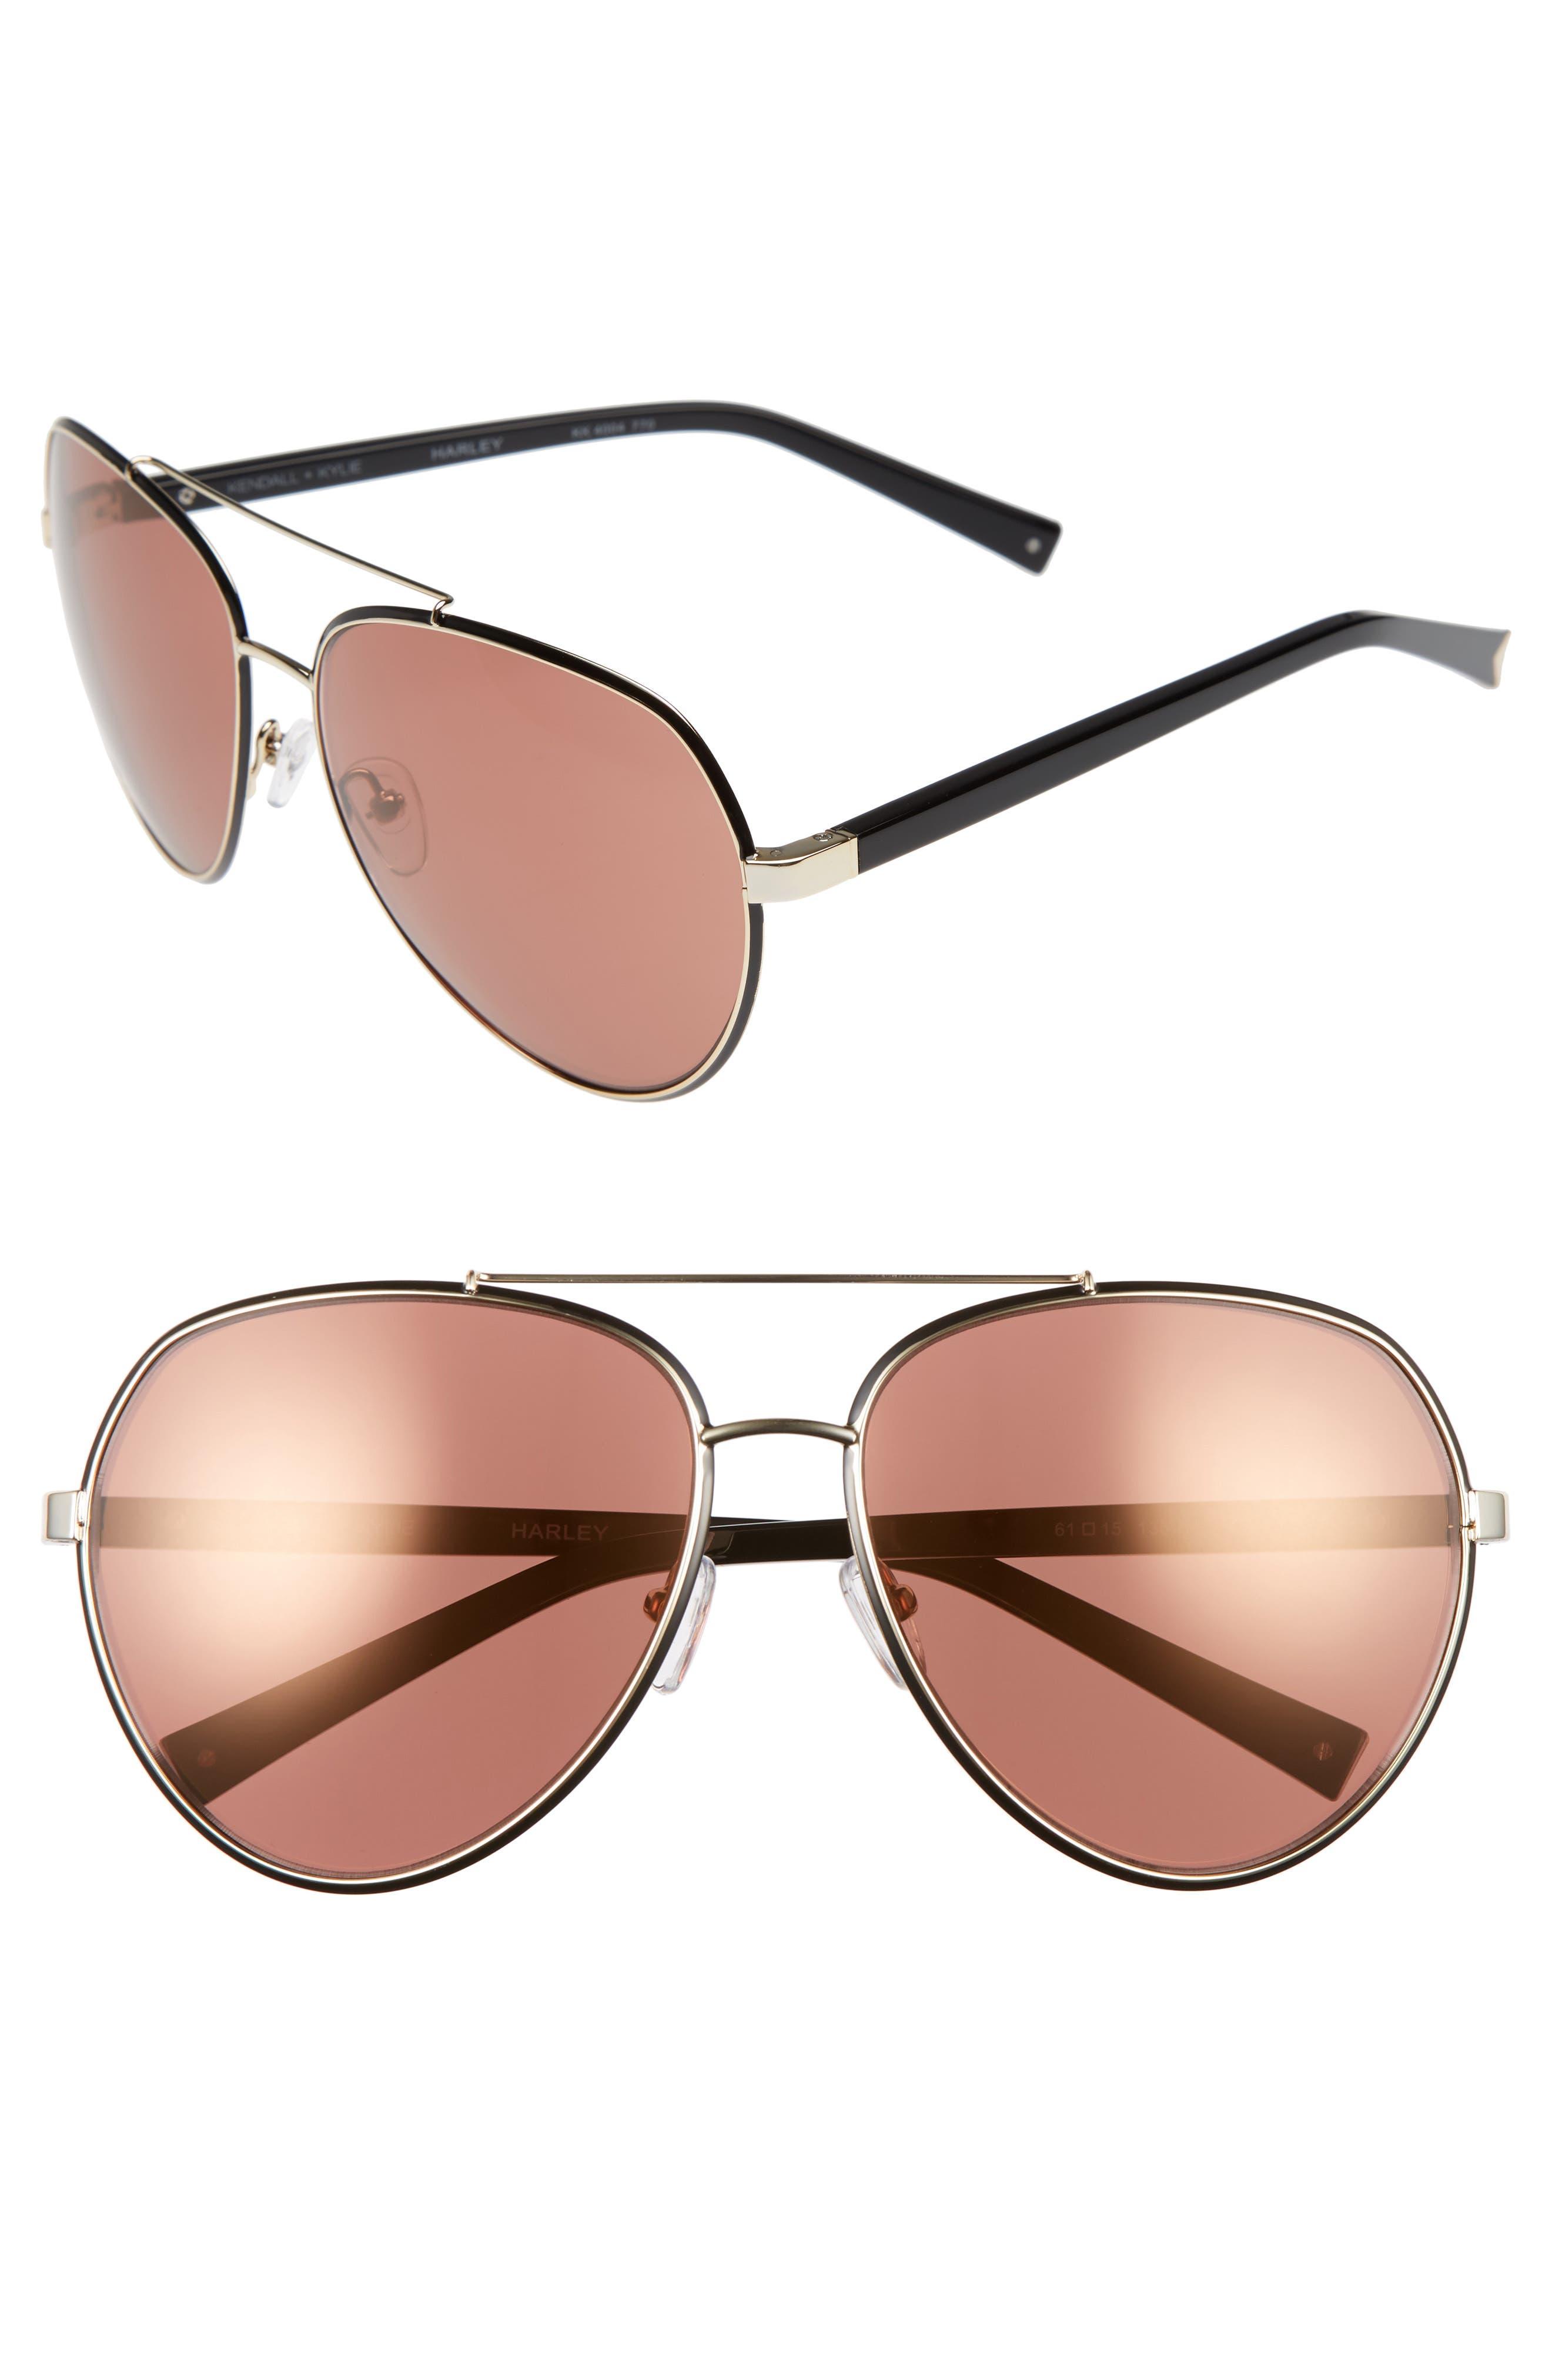 61mm Aviator Sunglasses,                             Main thumbnail 1, color,                             Shiny Gold/ Shiny Black